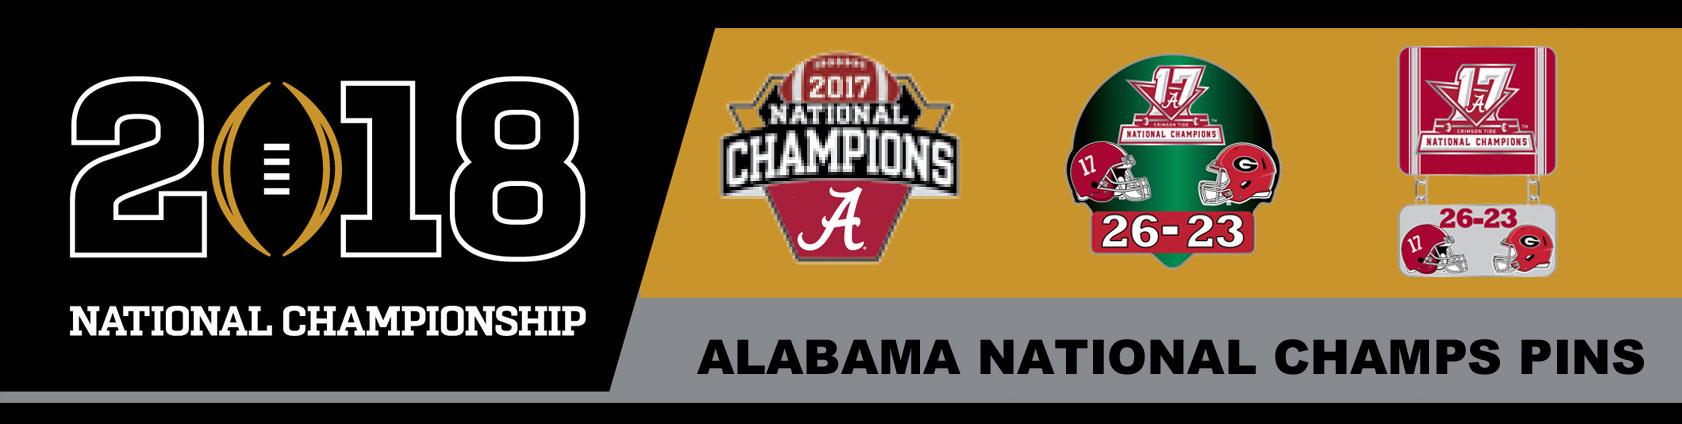 Alabama 2017 National Champs Pins